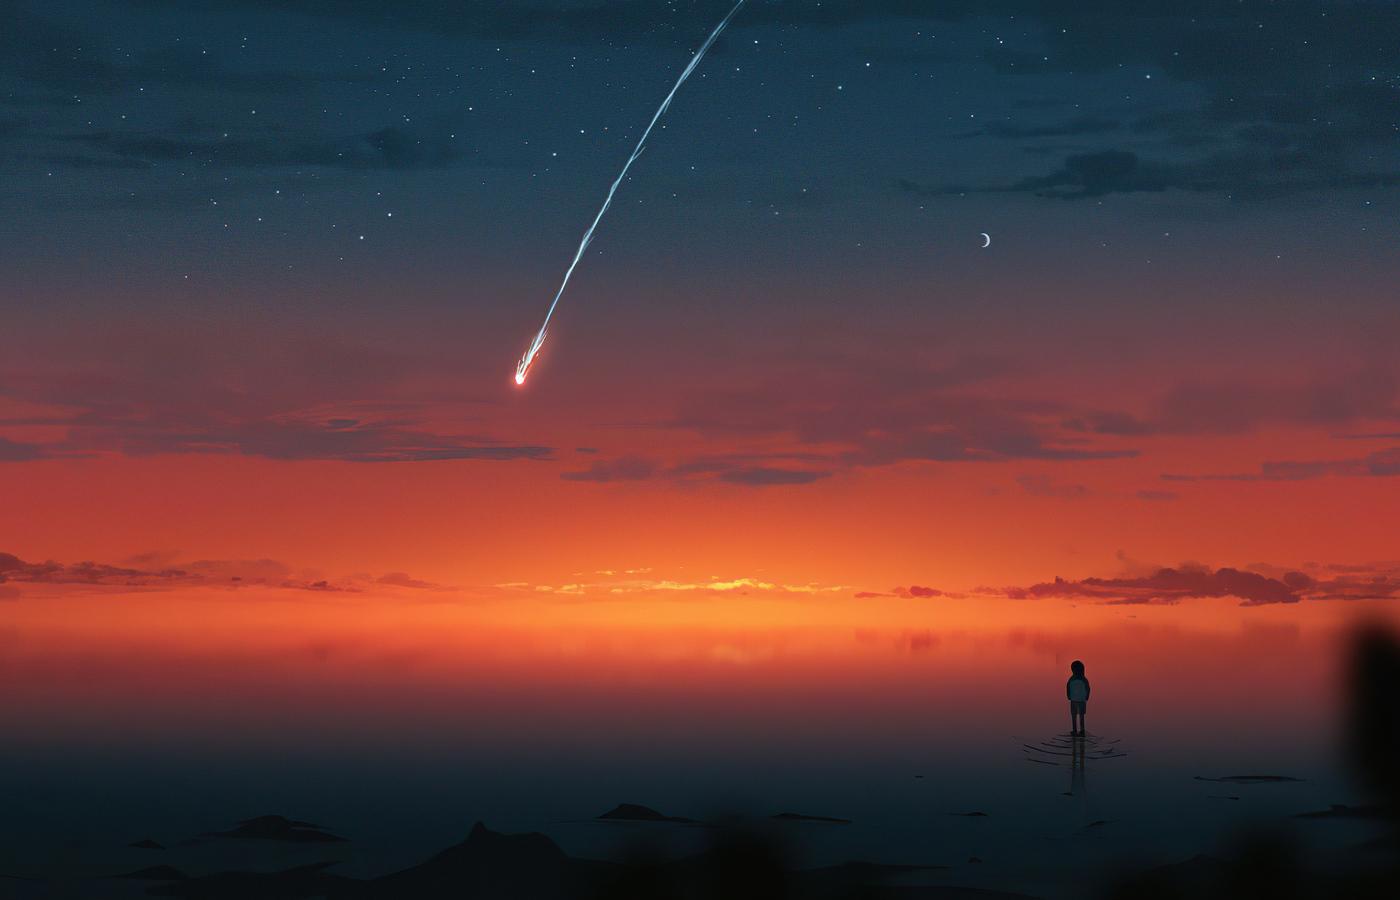 falling-star-5k-ca.jpg